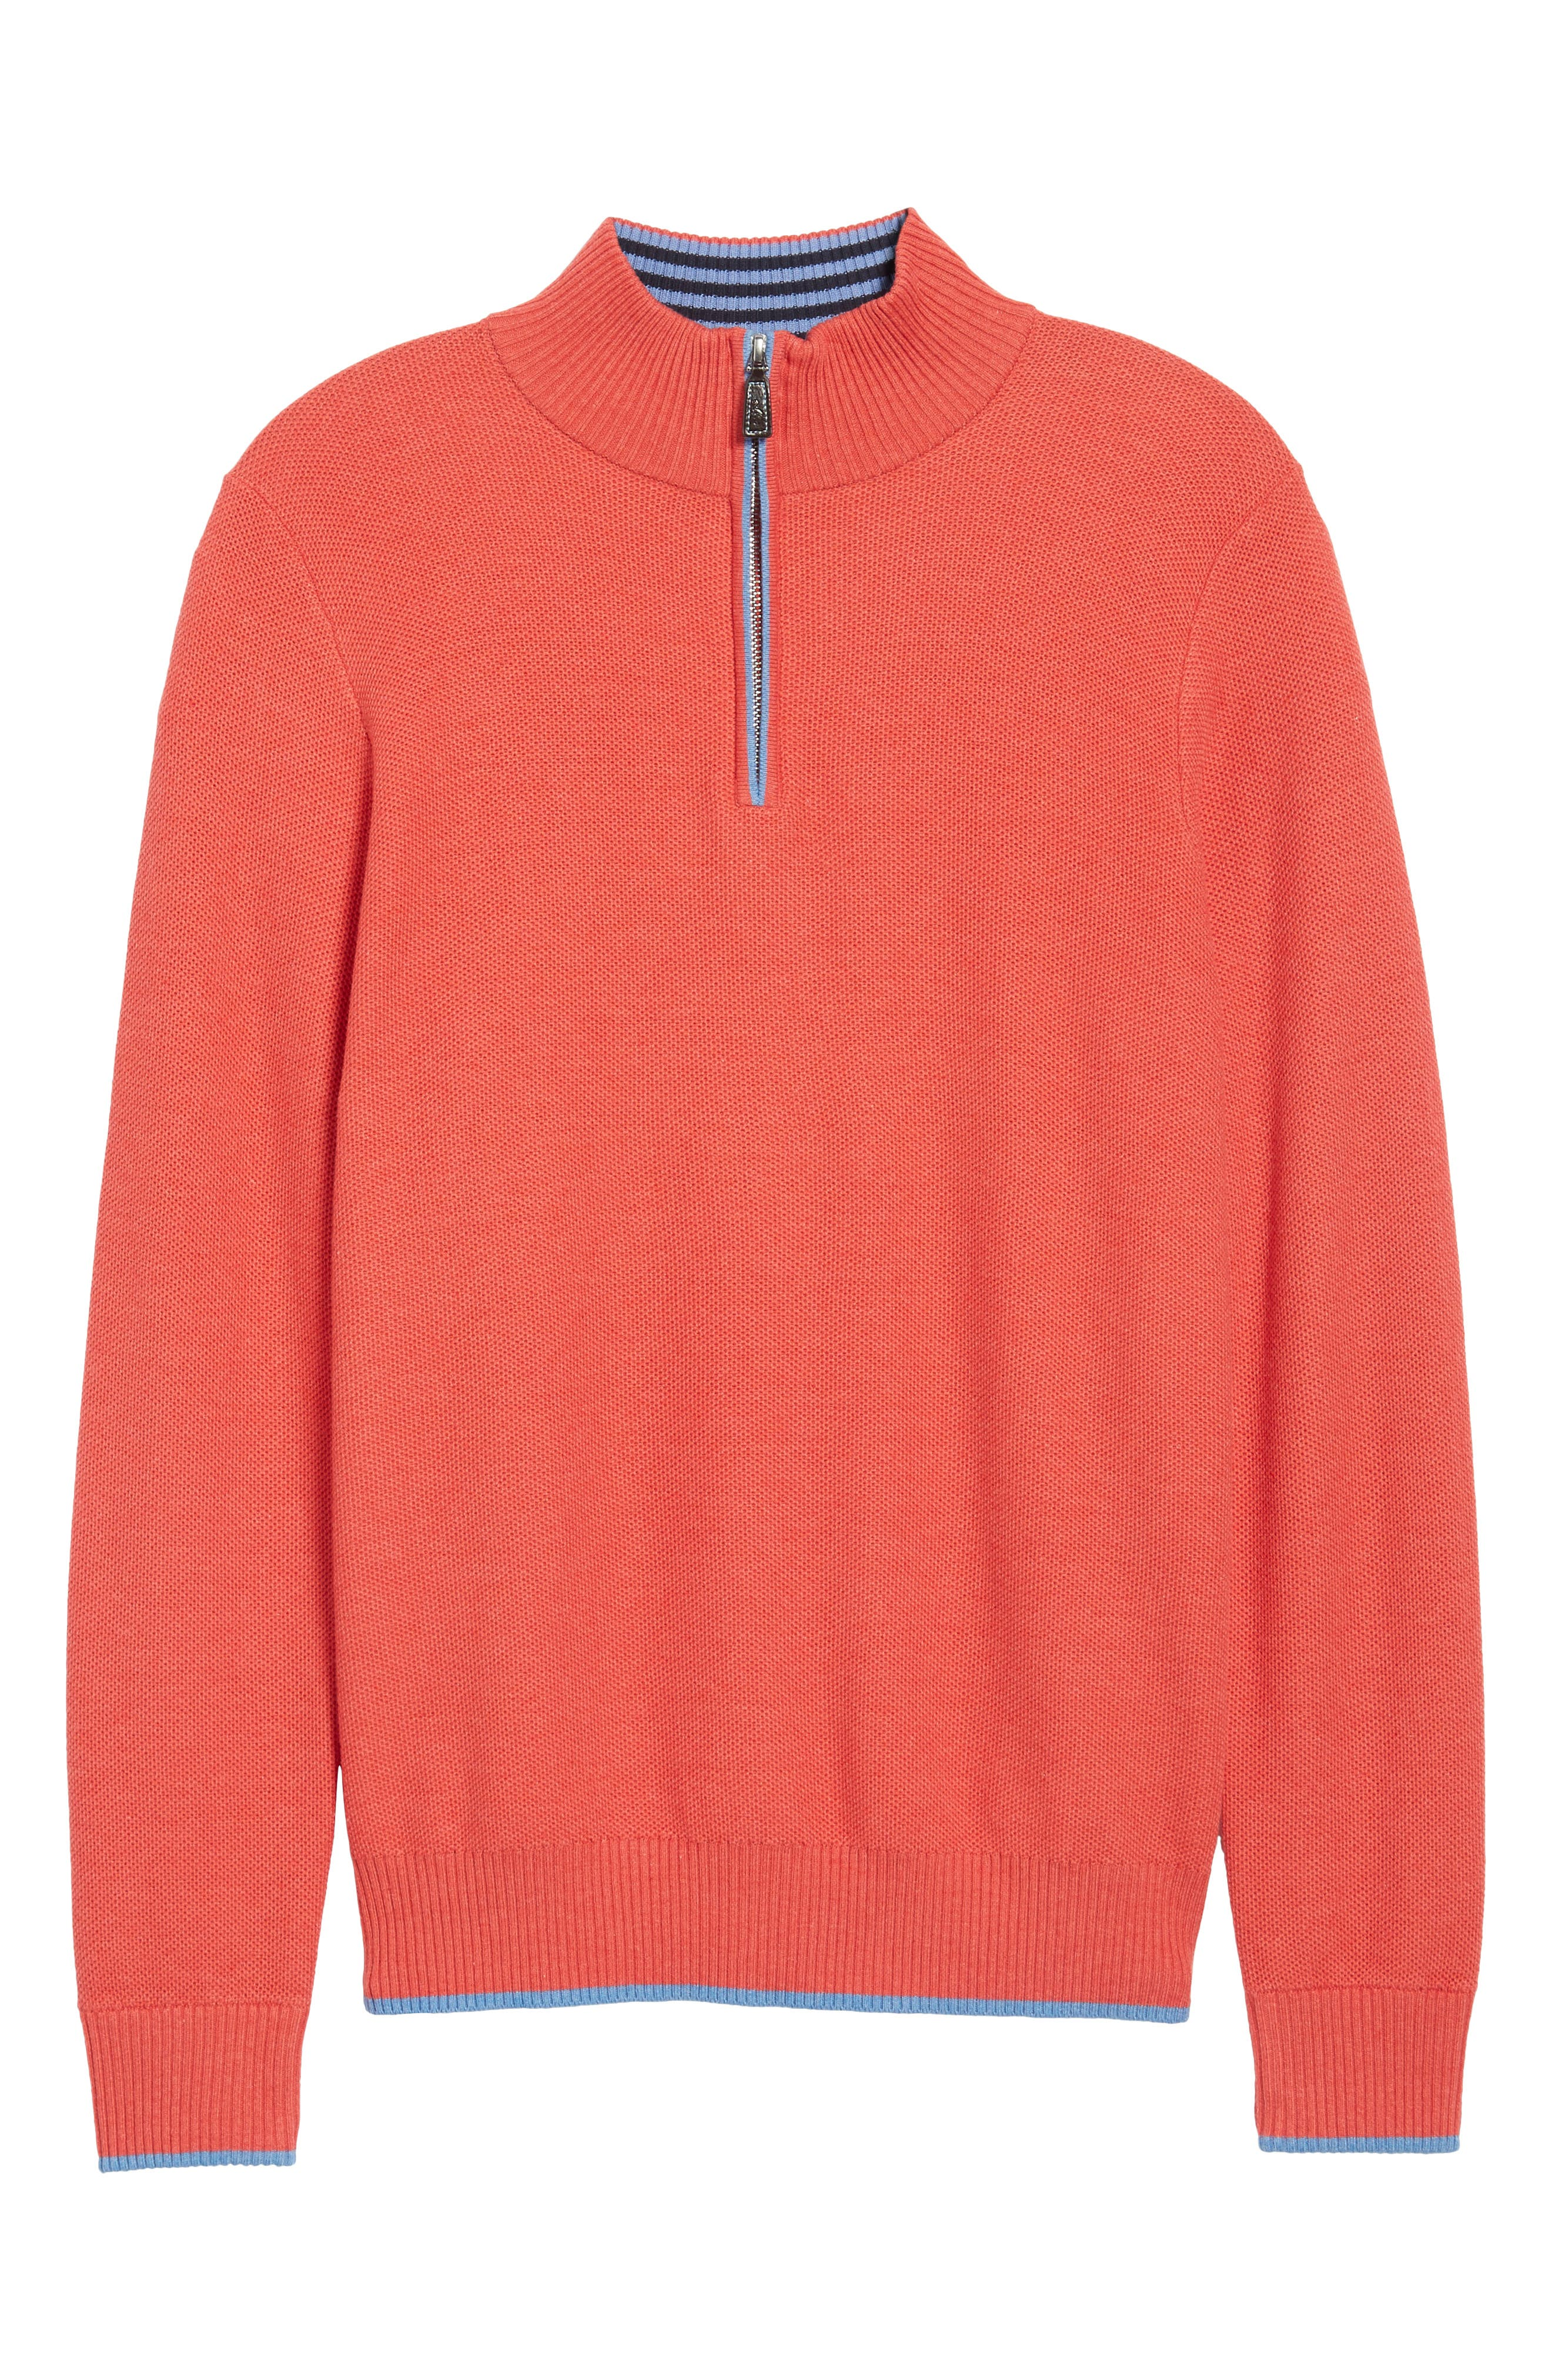 Sorrel Tipped Quarter Zip Sweater,                             Alternate thumbnail 6, color,                             Coral